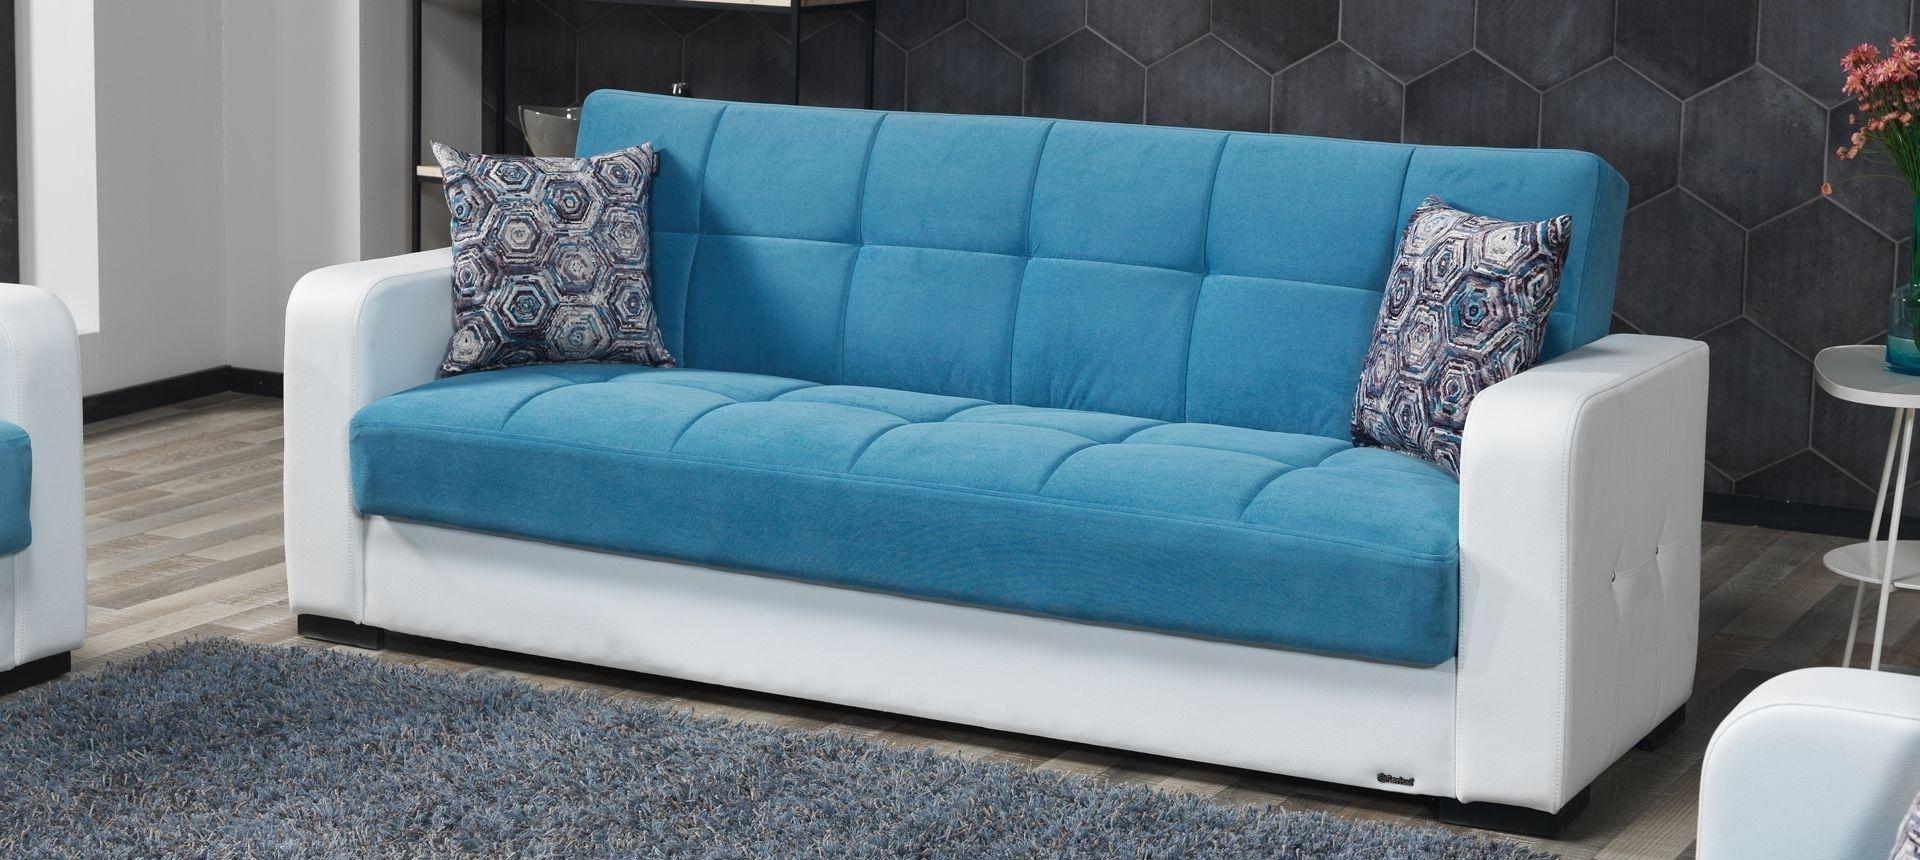 Canapea extensibila cu lada de depozitare, tapitata cu stofa 3 locuri Destina Albastru / Alb K1, l222xA72xH83 cm somproduct.ro